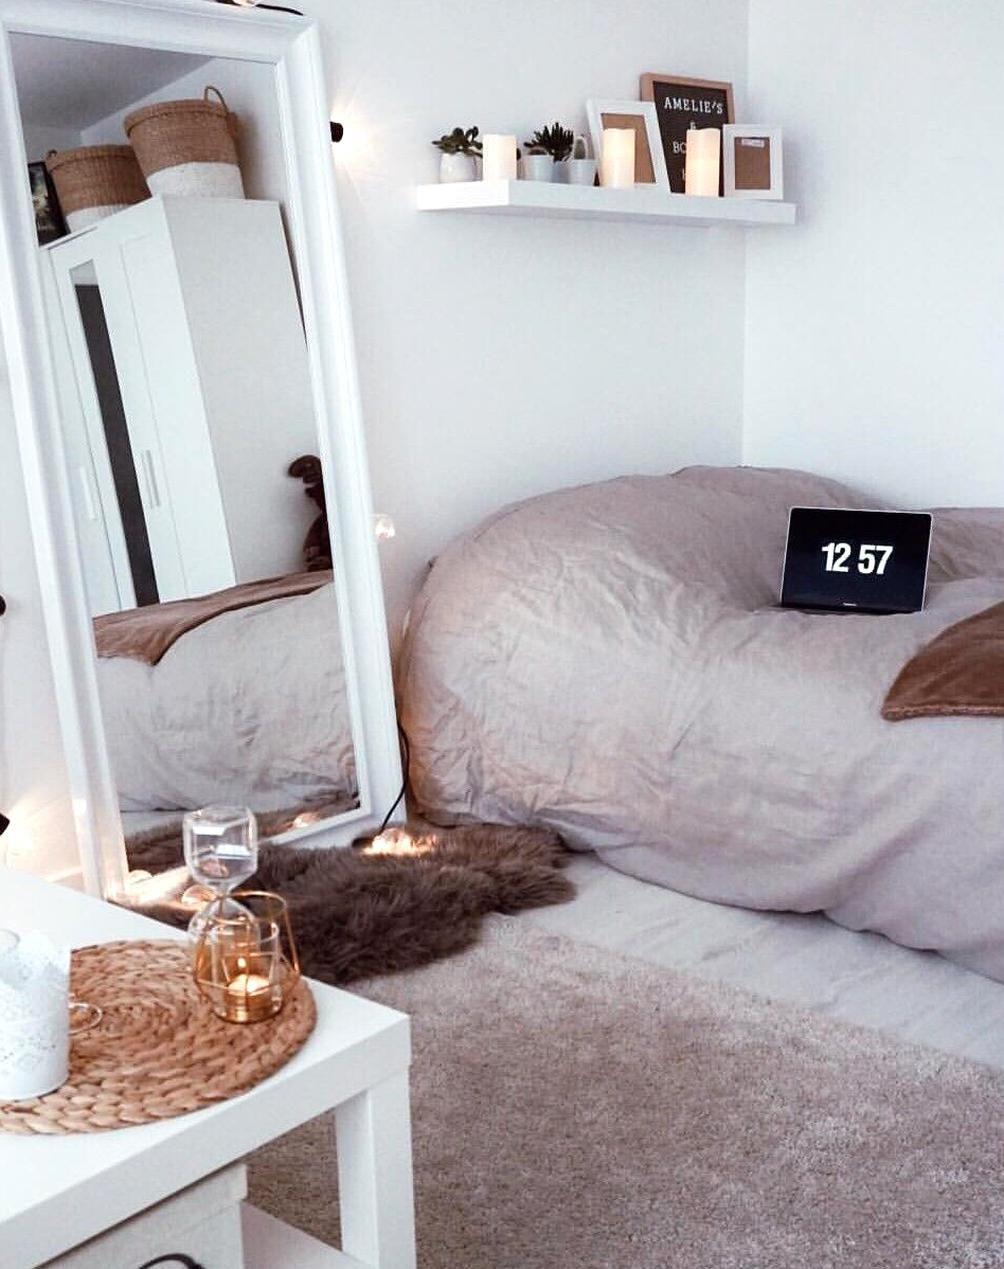 Pinterest Trinitie99 Dorm Room Ideas For Girls Minimalist Cozy Neutrals In 2020 Small Bedroom College Dorm Room Decor Dorm Room Decor